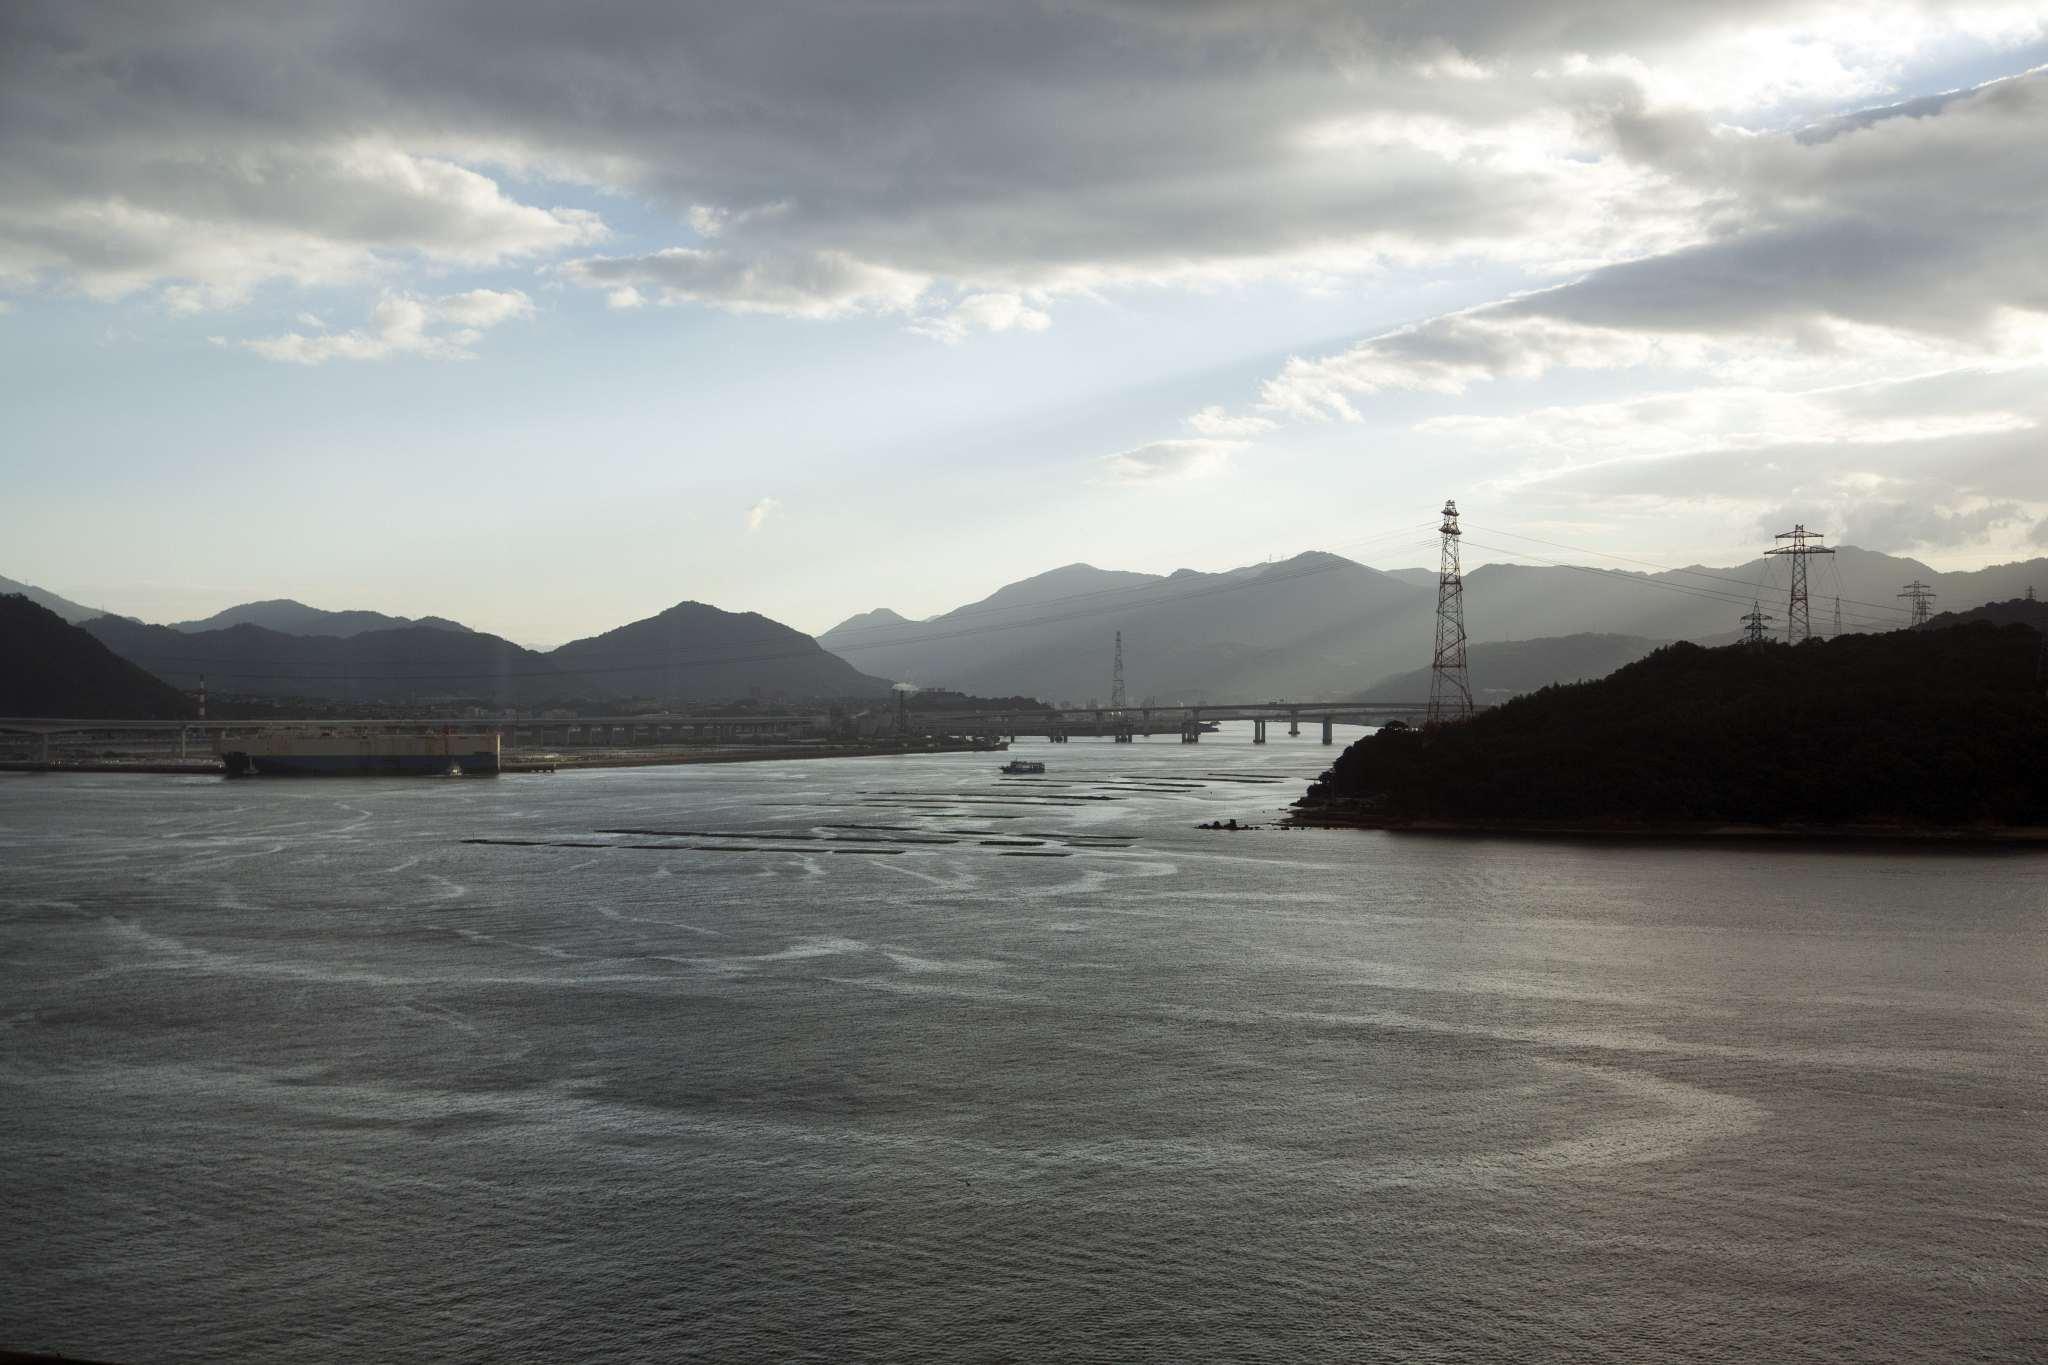 Hiroshima Port at low tide.